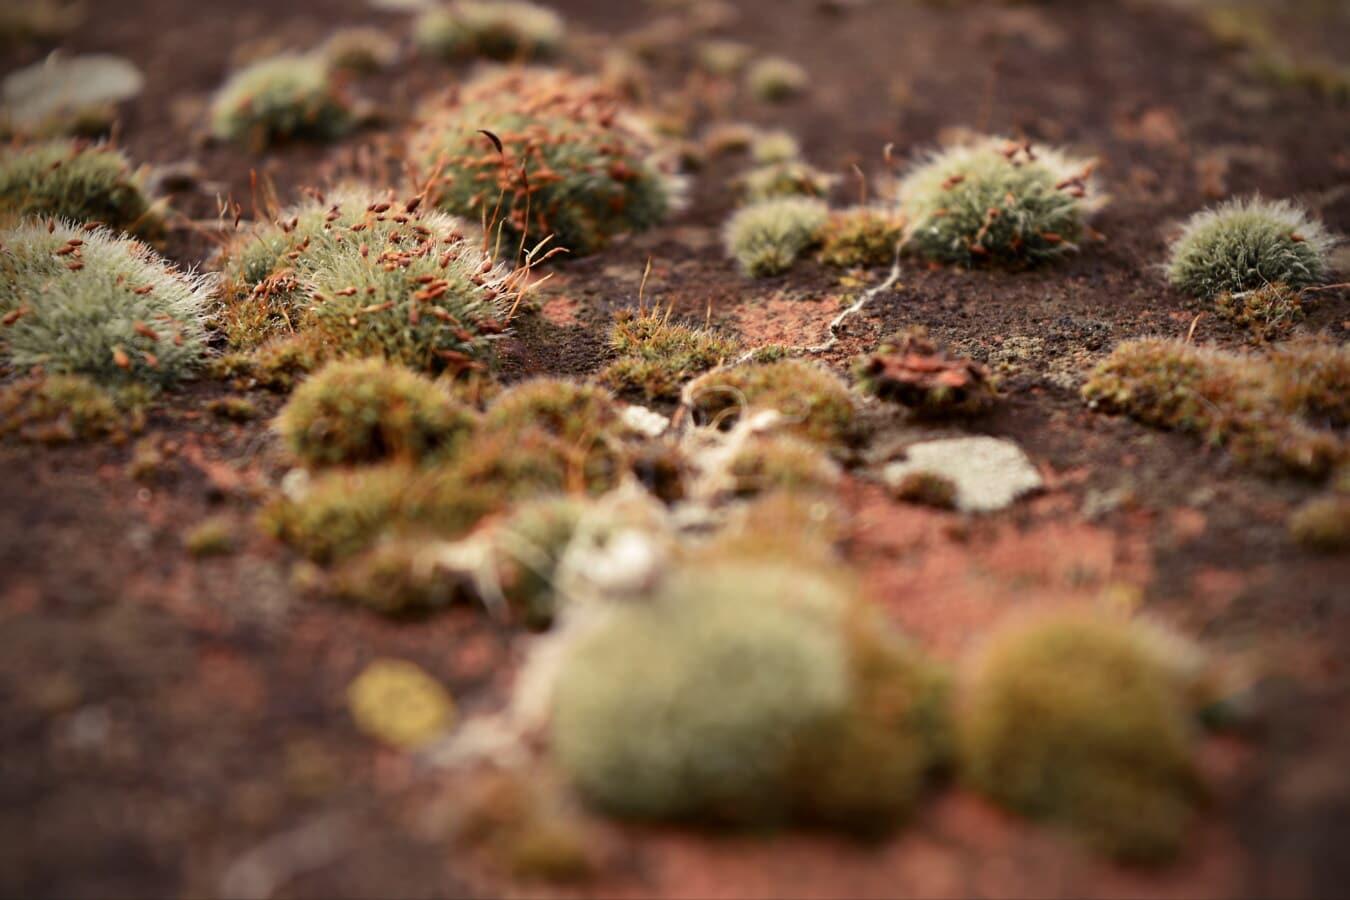 lichen, mossy, moss, autumn season, close-up, flowering, carnivorous plant, nature, leaf, flora